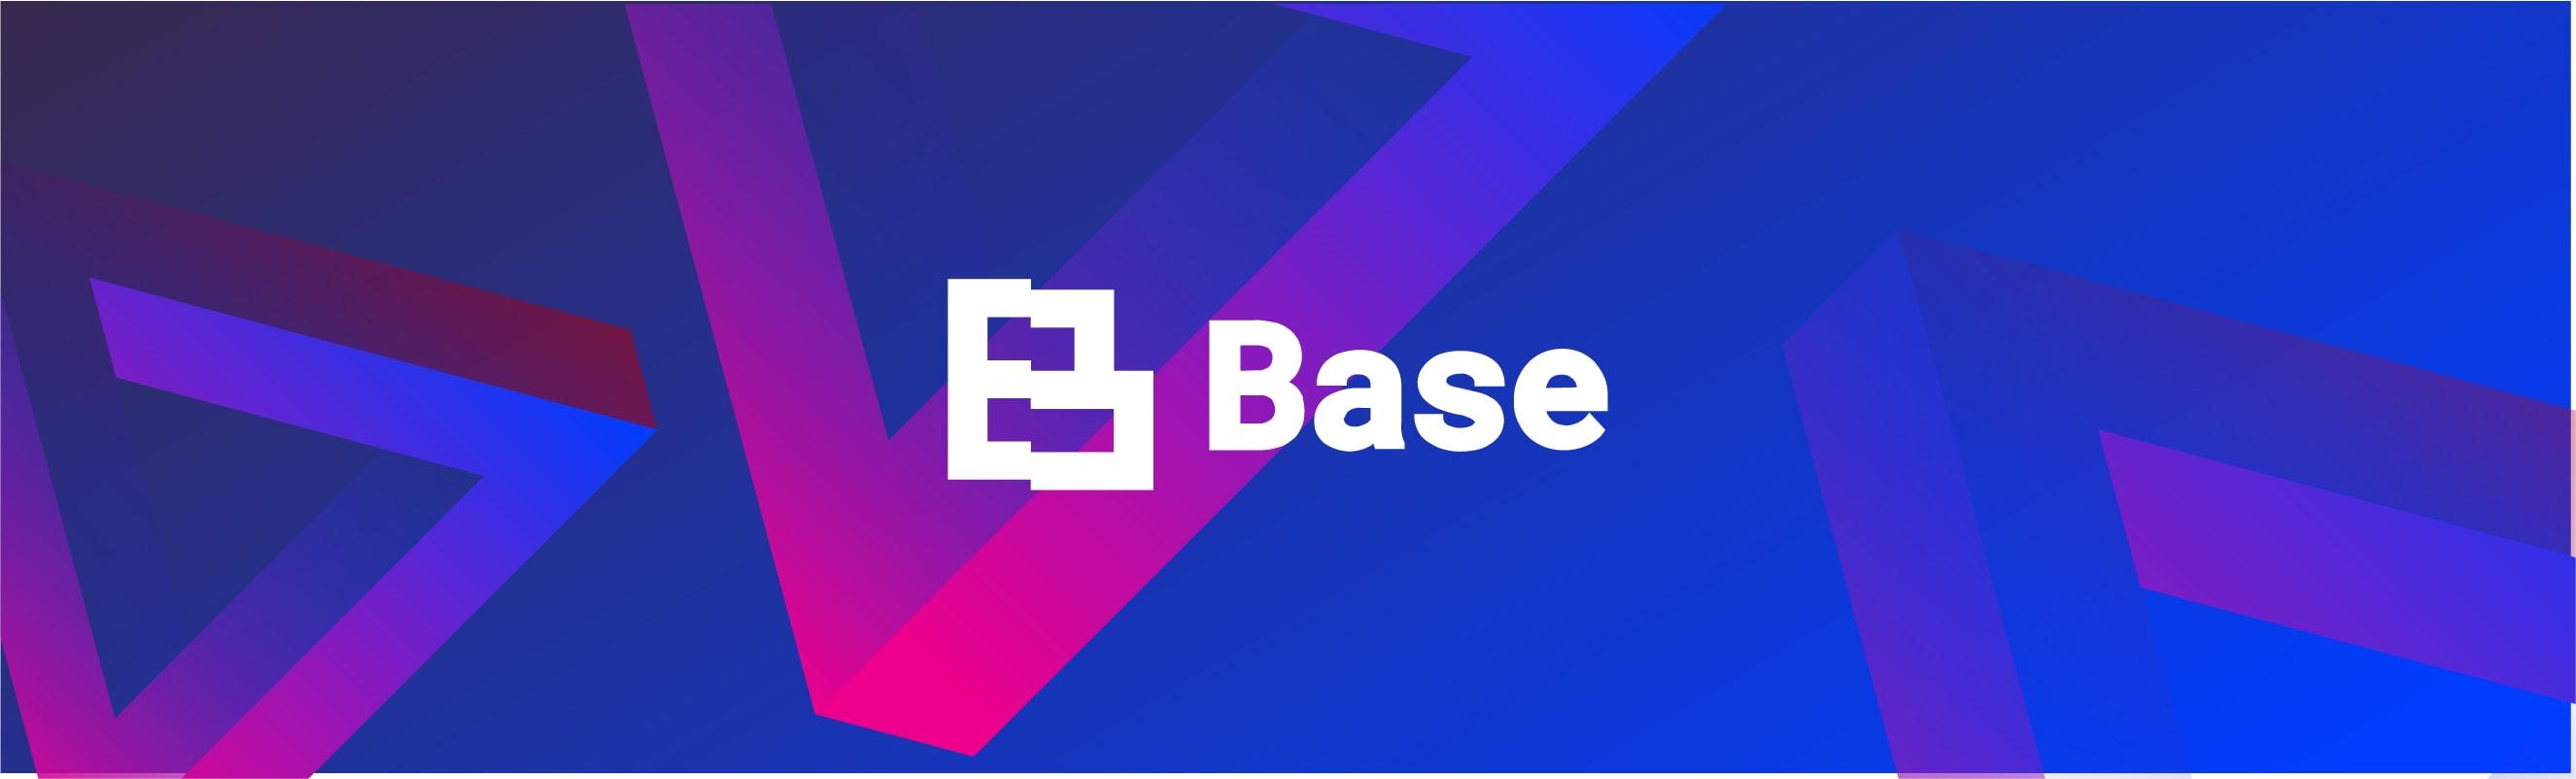 نظام تصميم بيانات Base